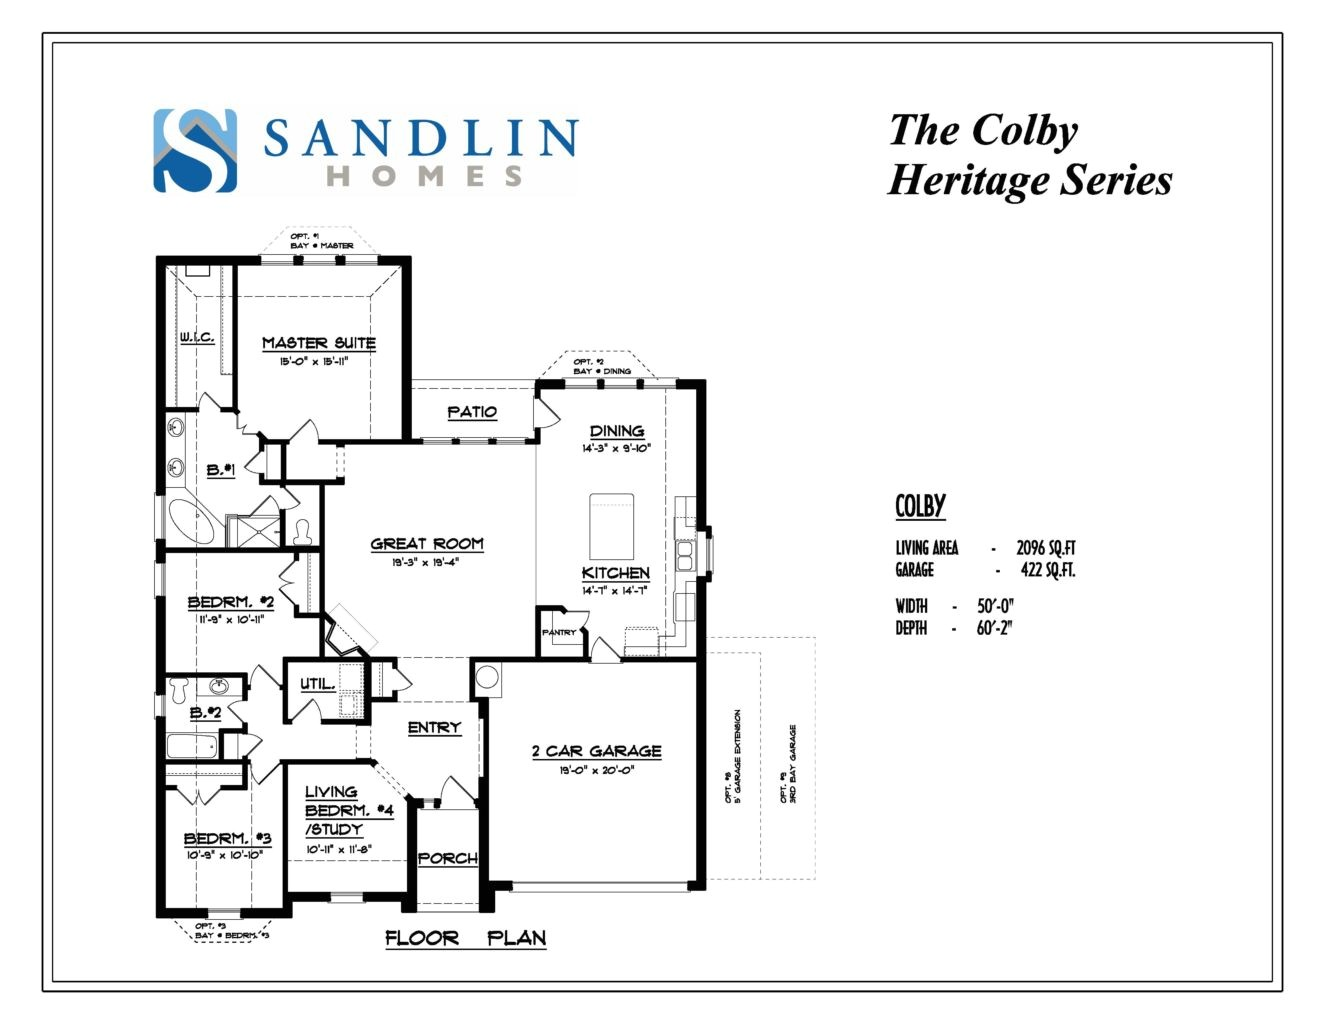 sandlin home plans